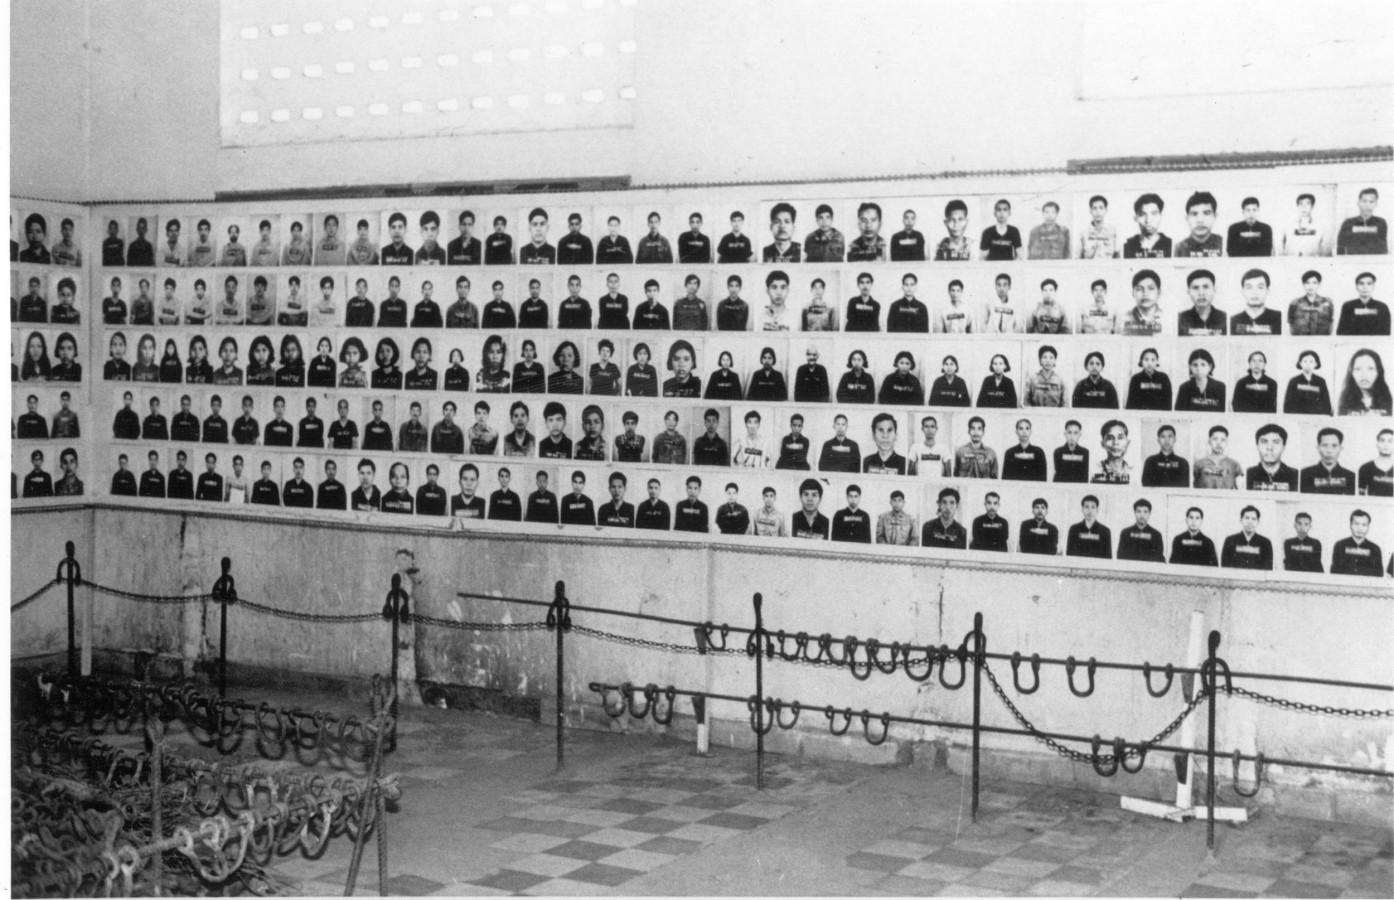 genocide essays mary shelley frankenstein essay rwanda genocide rape